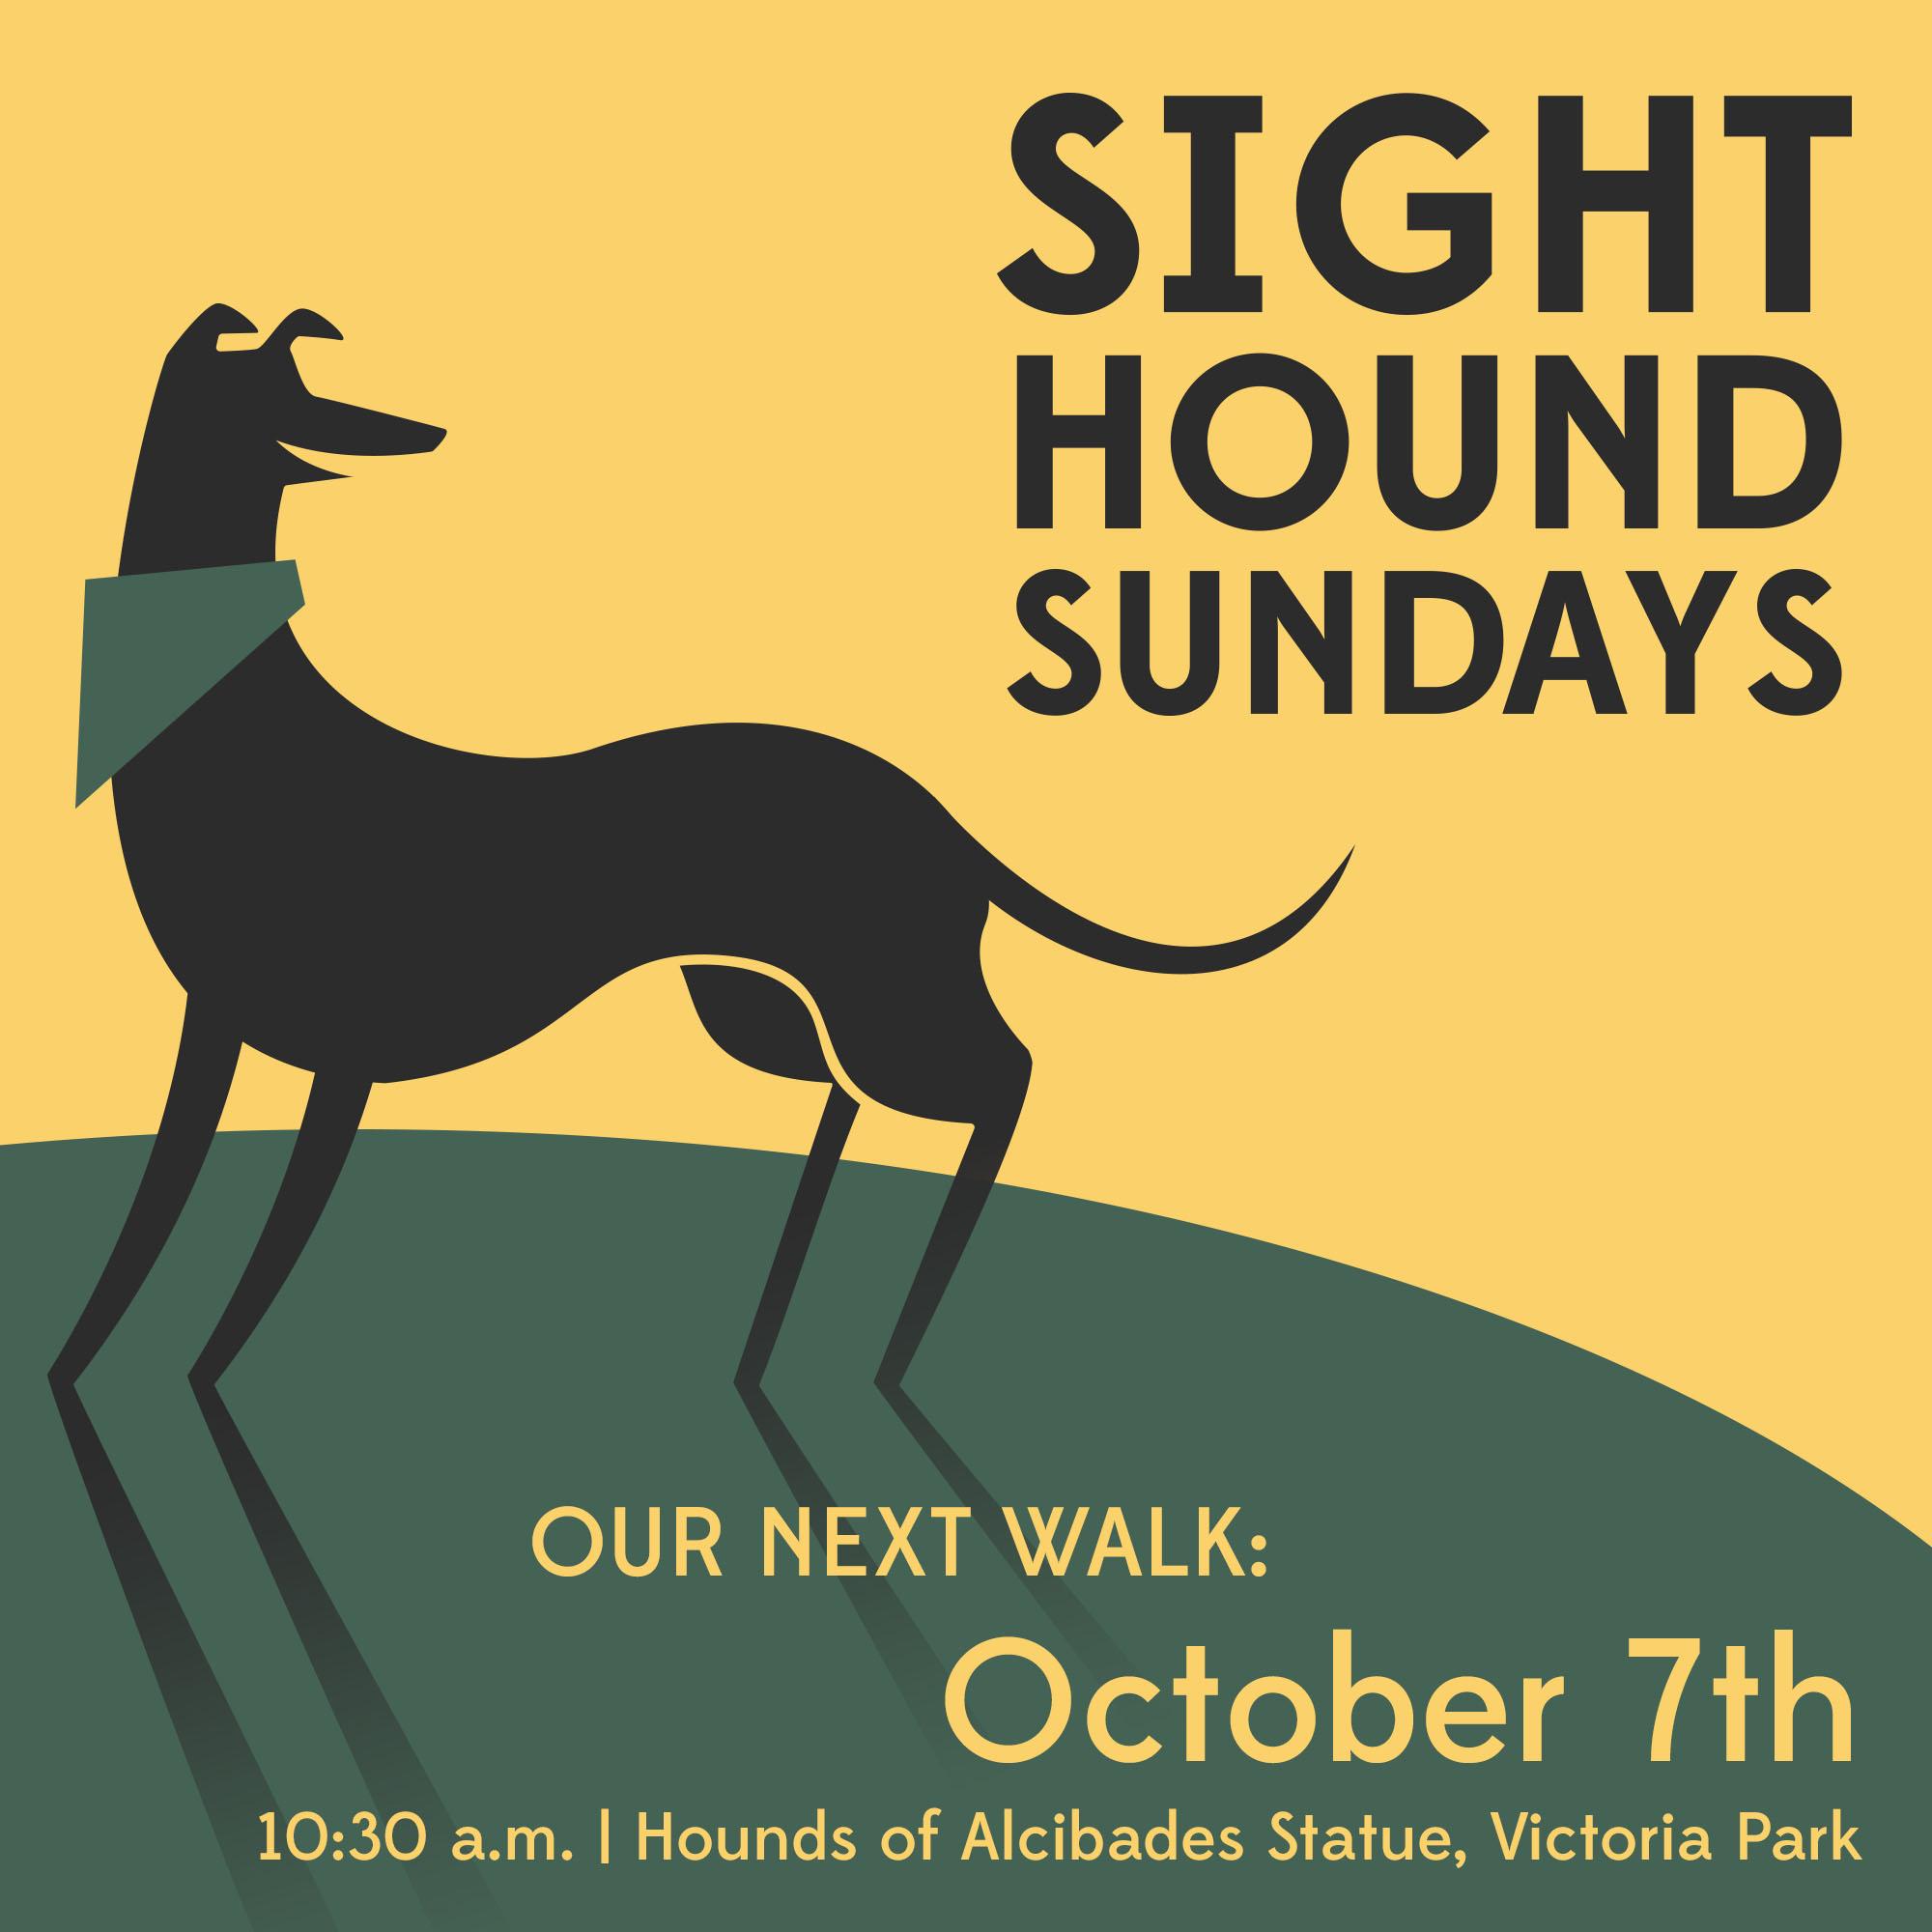 SighthoundSundays_Instagram_Monthly_October.jpg